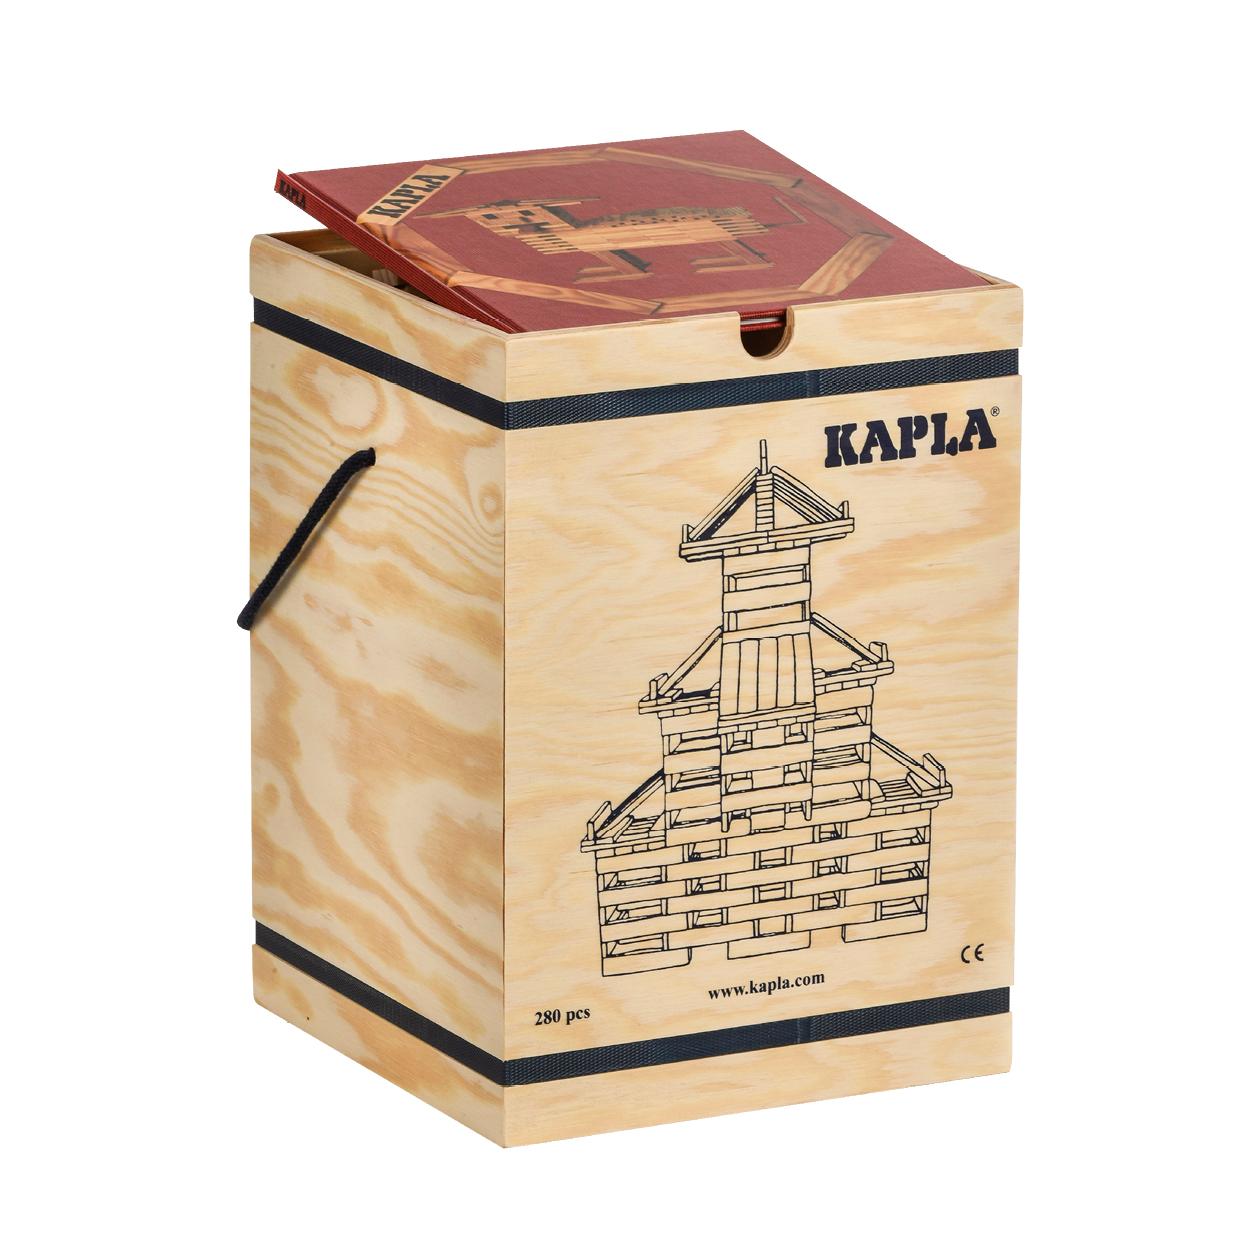 FAP-K-280-R-KAPLA280 積木盒-#1 紅 (280PCS)